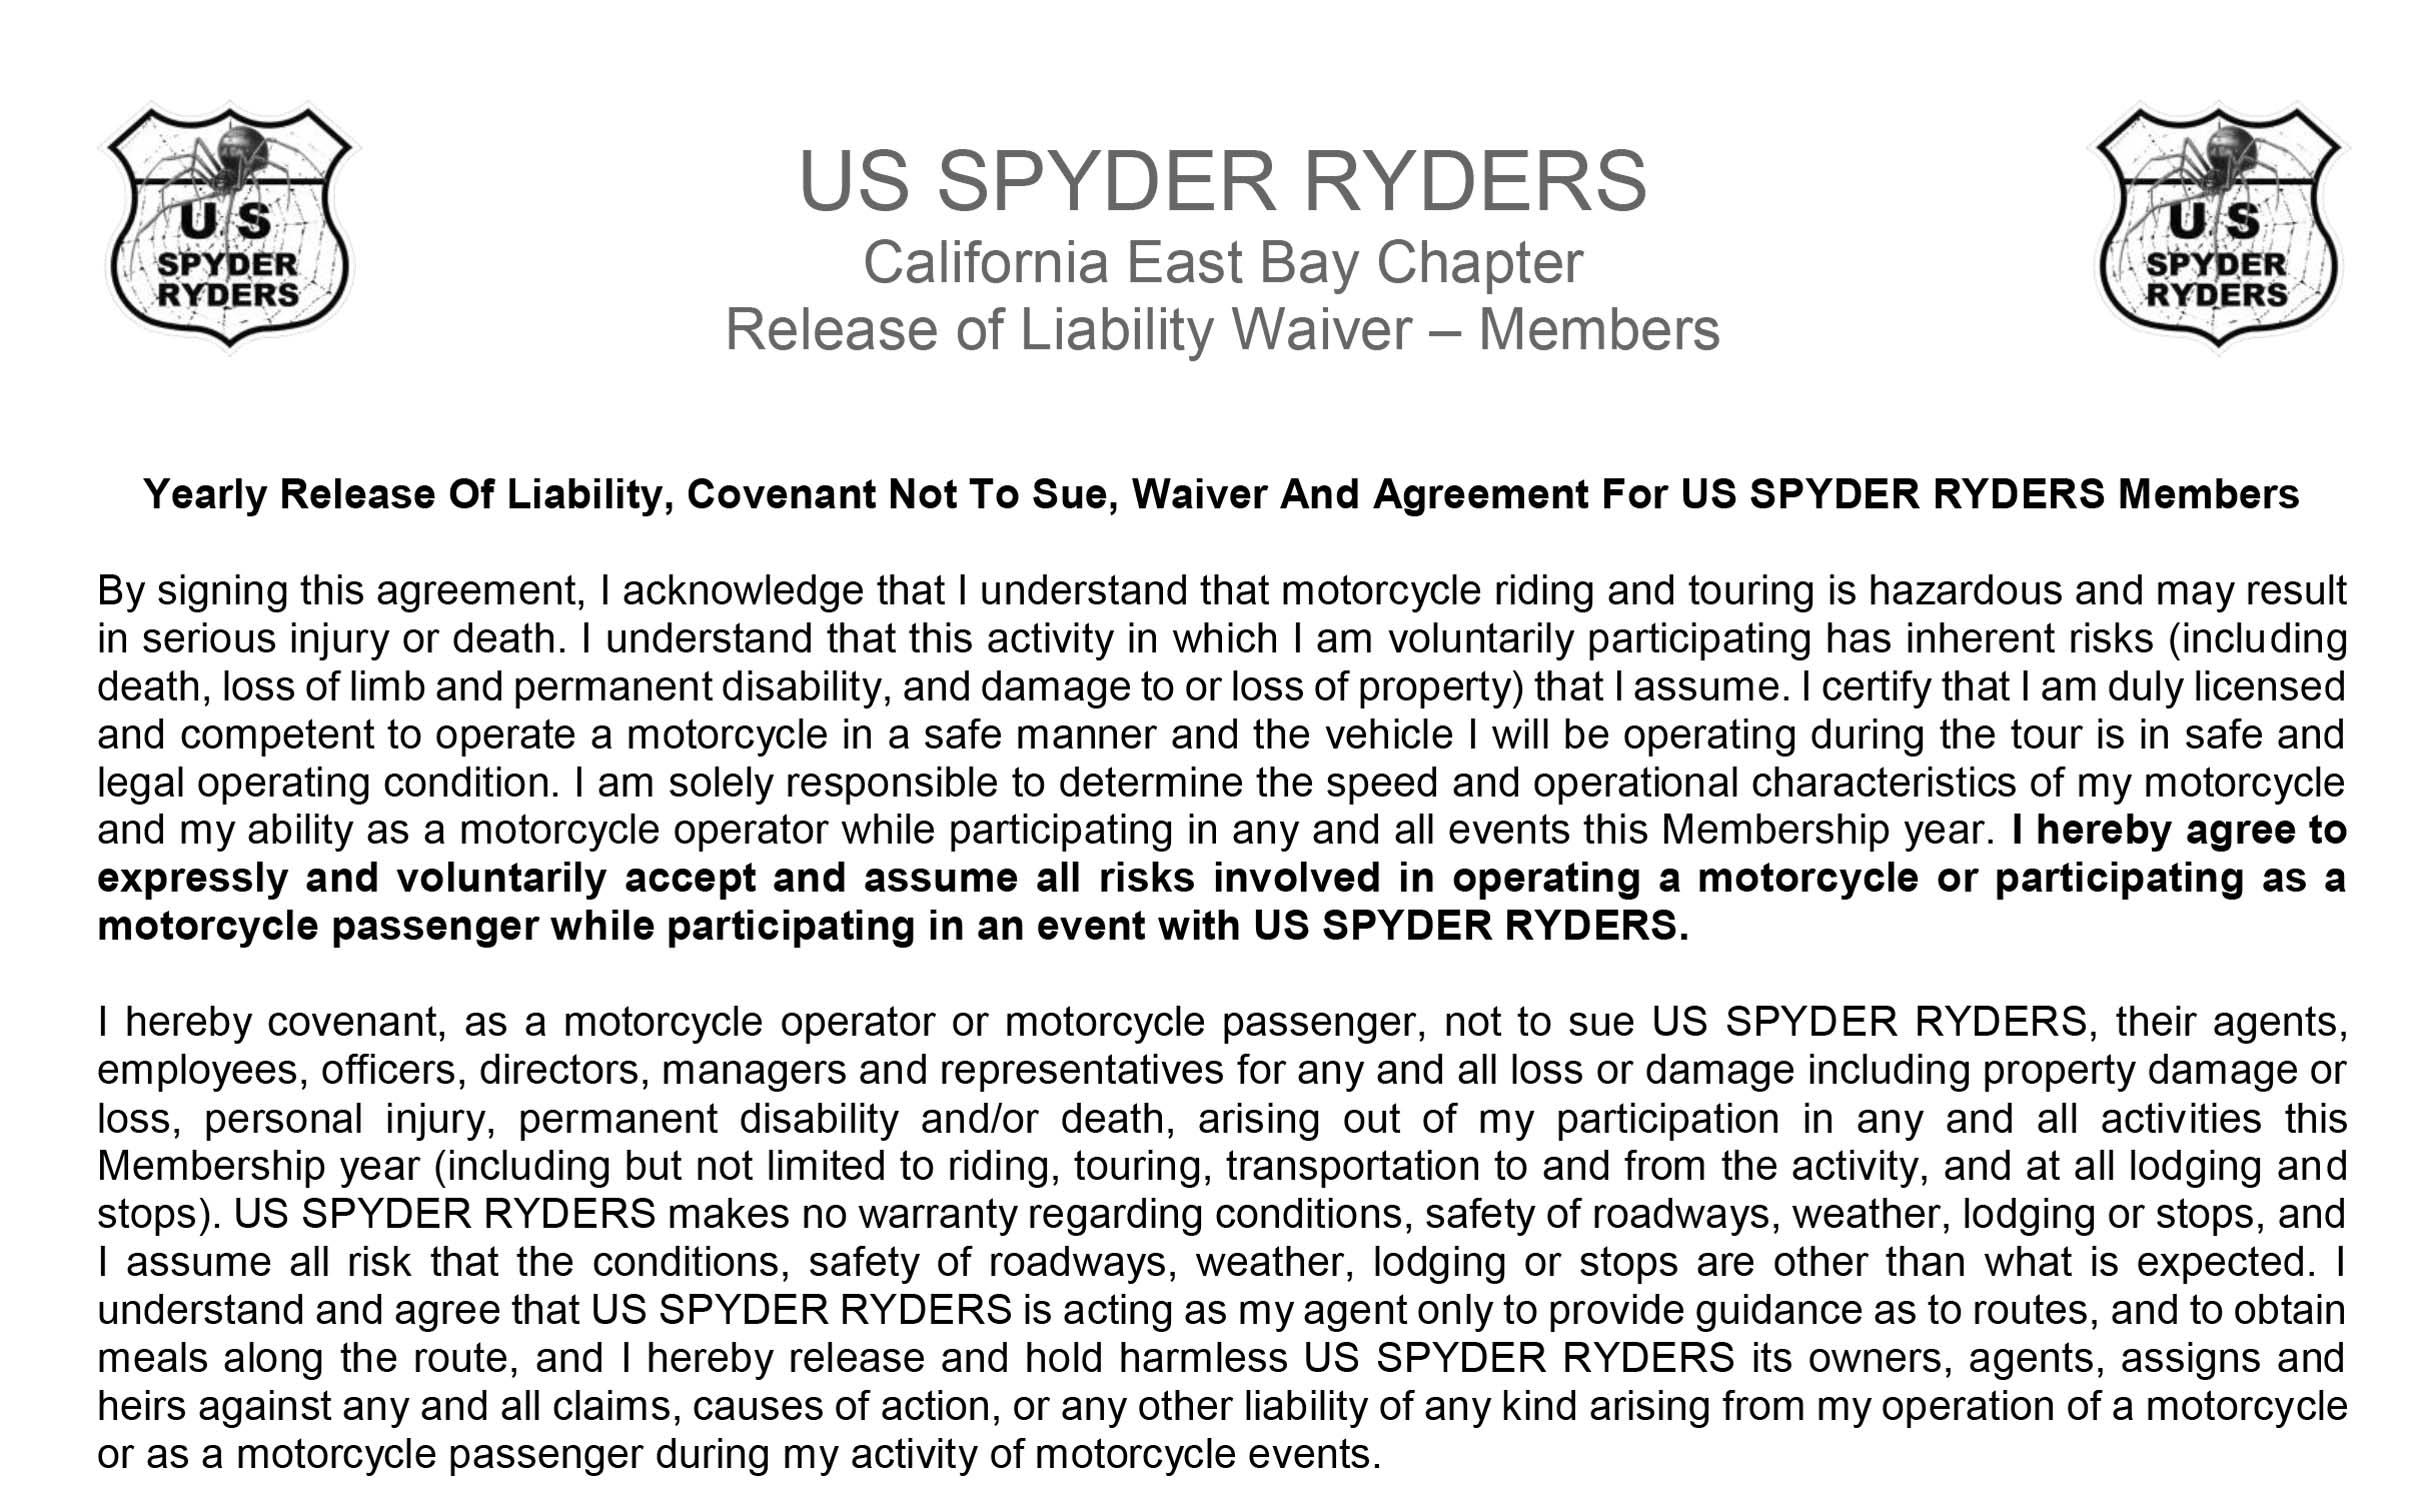 Release Of Liability - Member